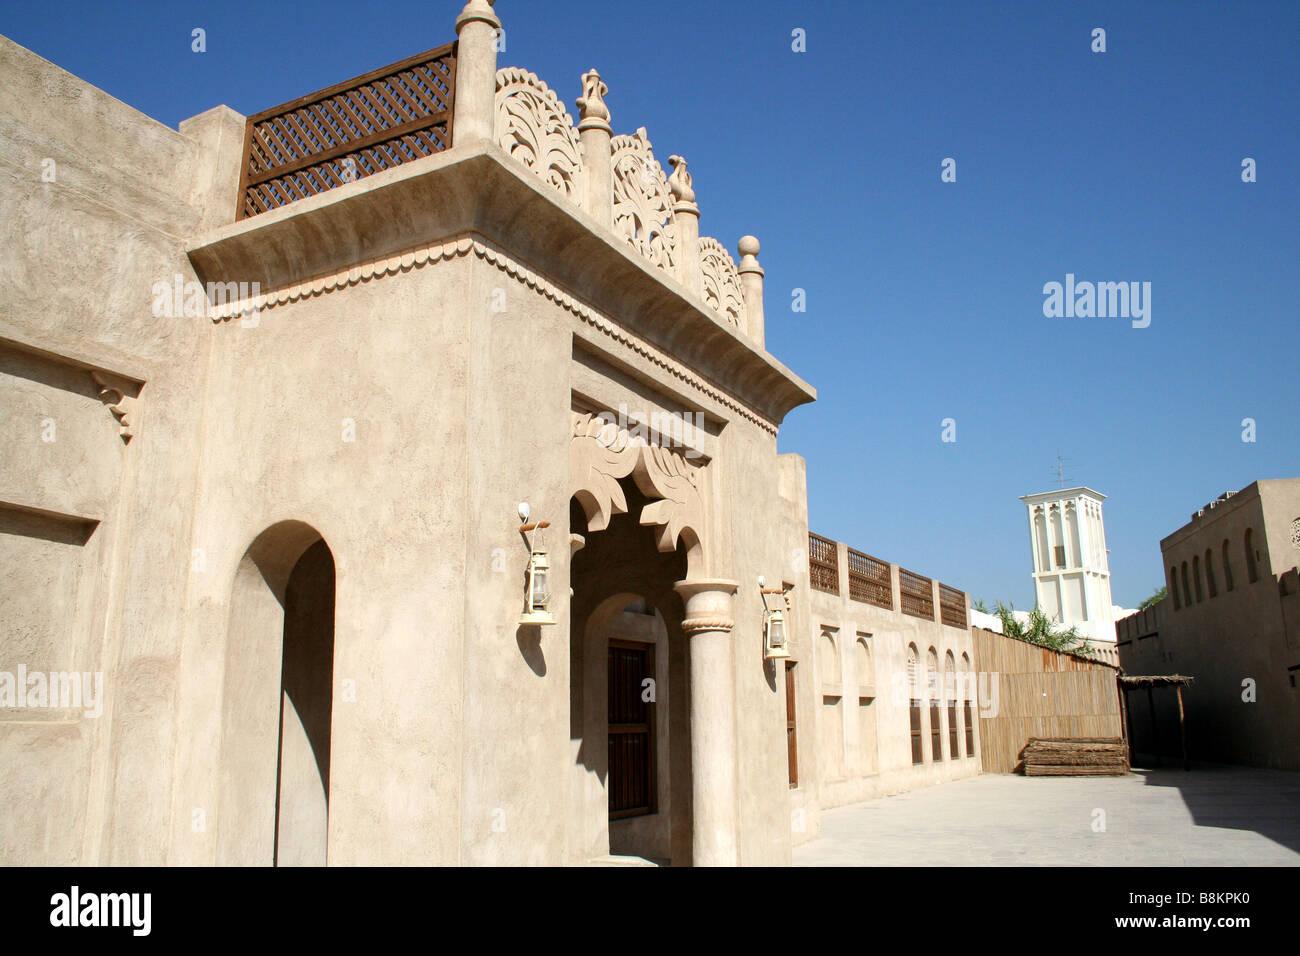 bur dubai muslim Dubai apartments/flats/houses aed 850 / month - bed space for muslim executive single bed in bur dubai 38938842 expatriatescom classified ad.